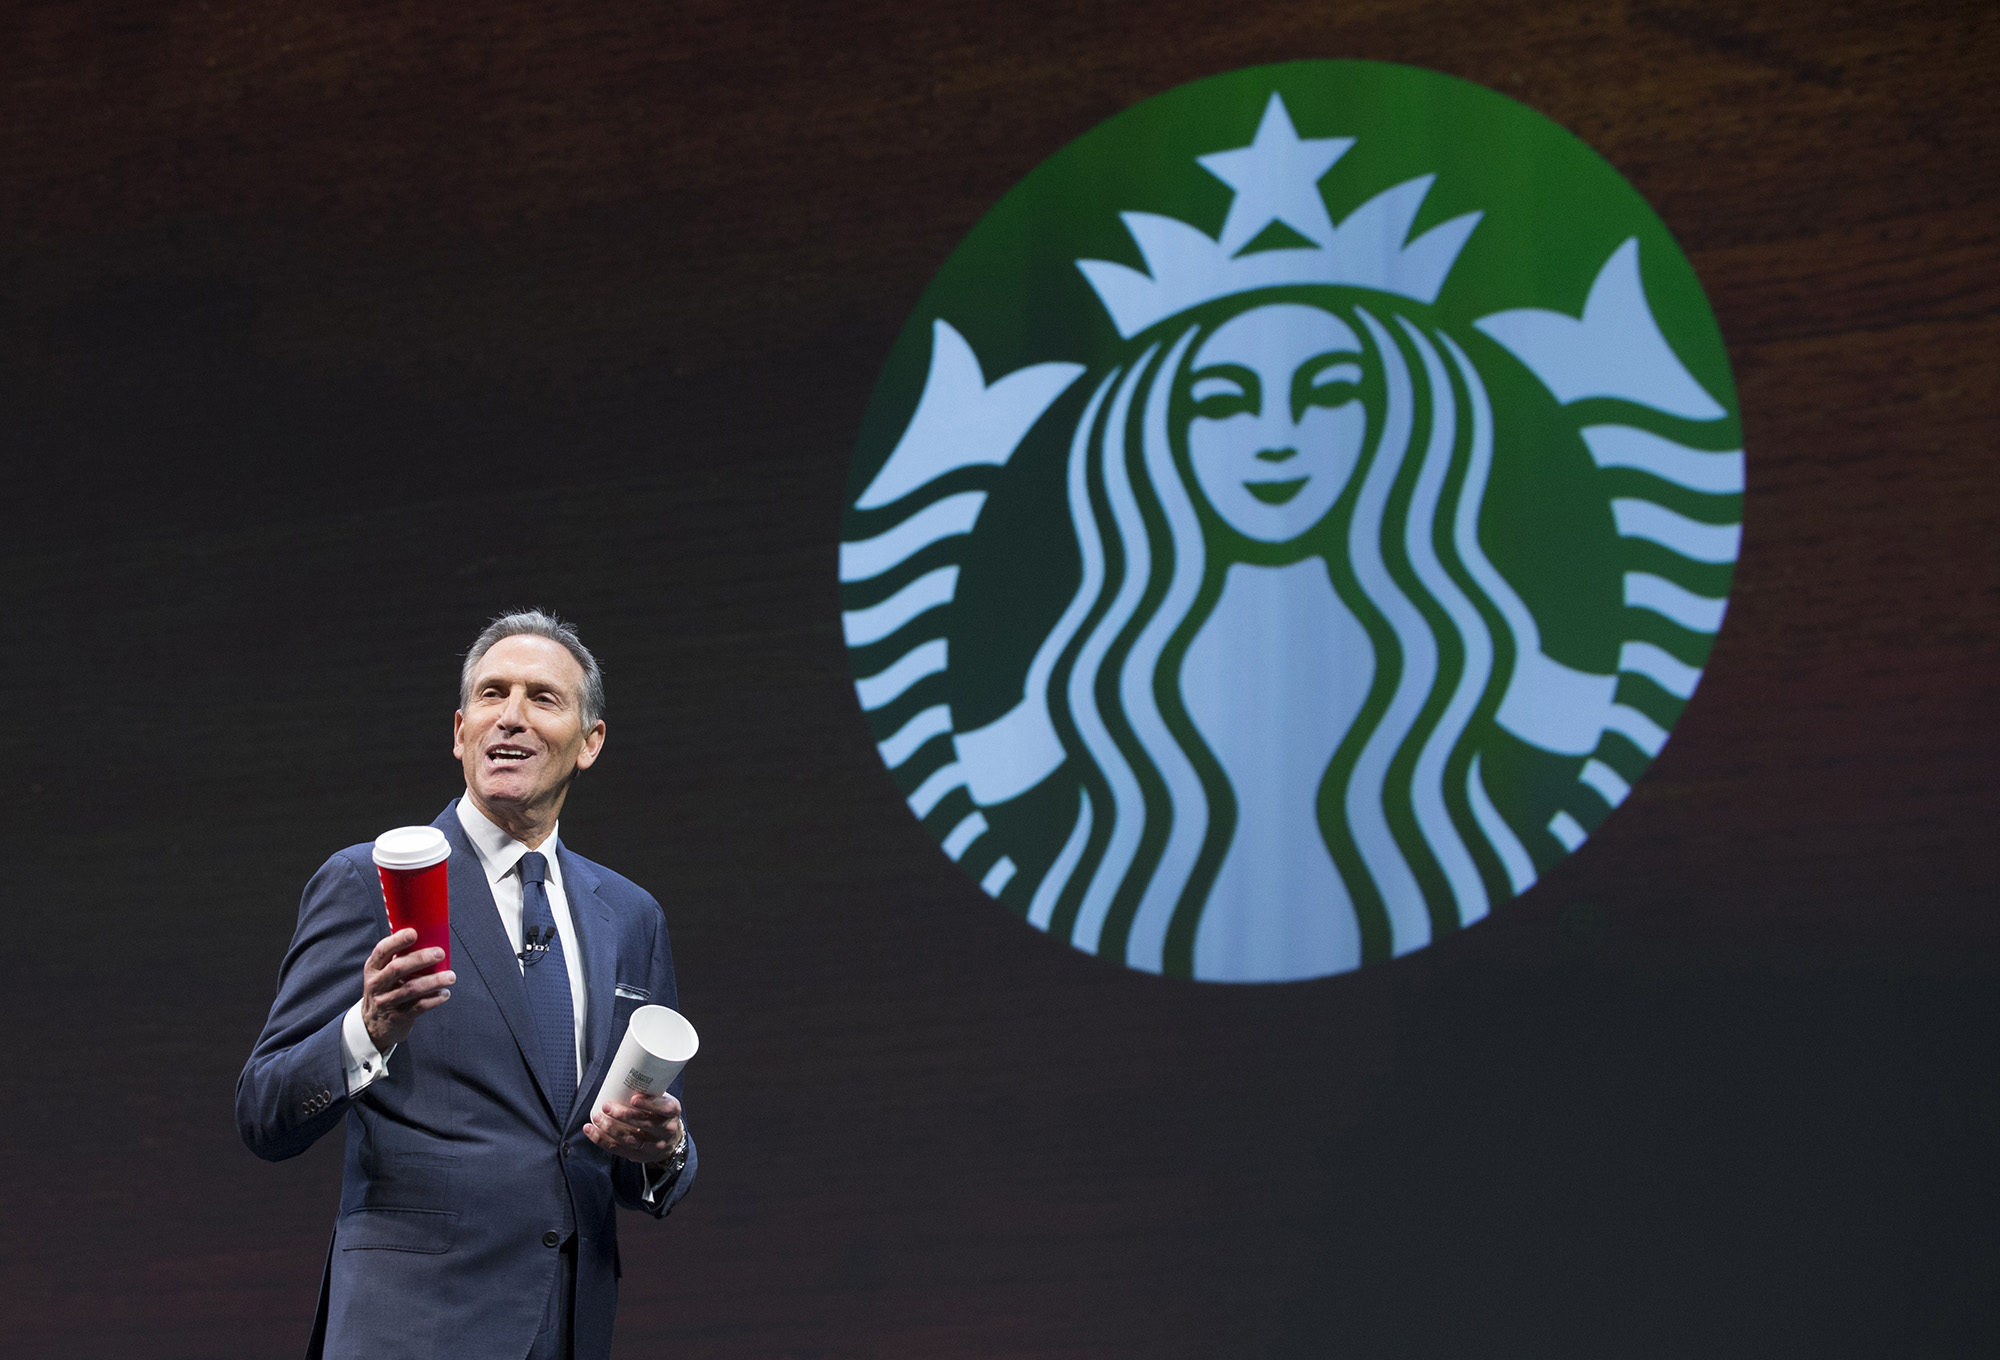 Xi Jinping wants Starbucks and Howard Schultz to help repair US-China ties